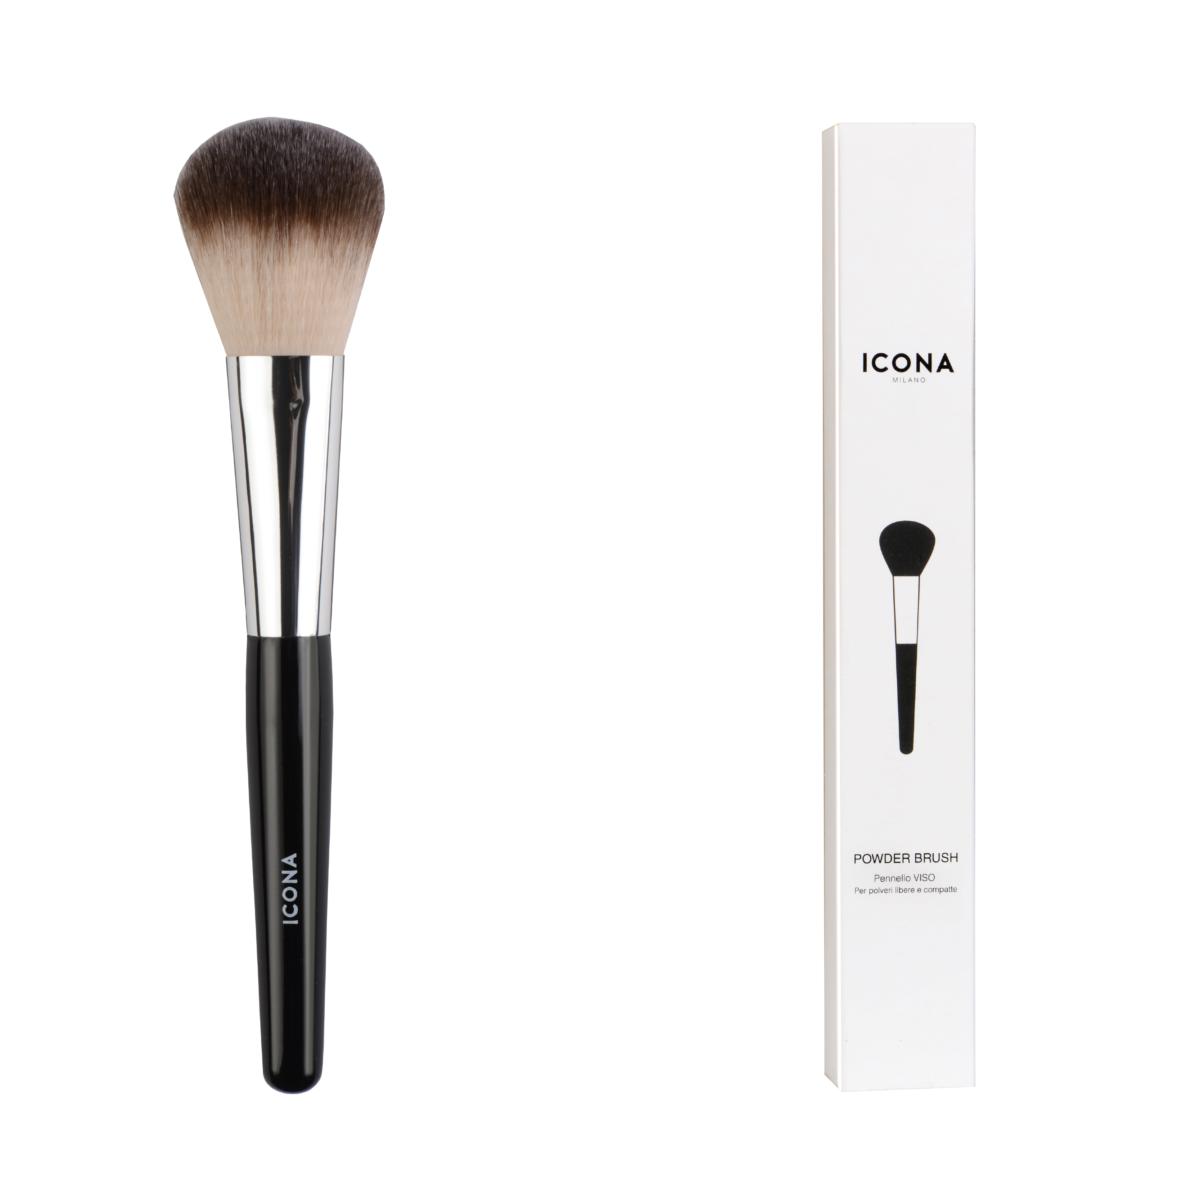 1010_Pennello viso powder - Icona make up